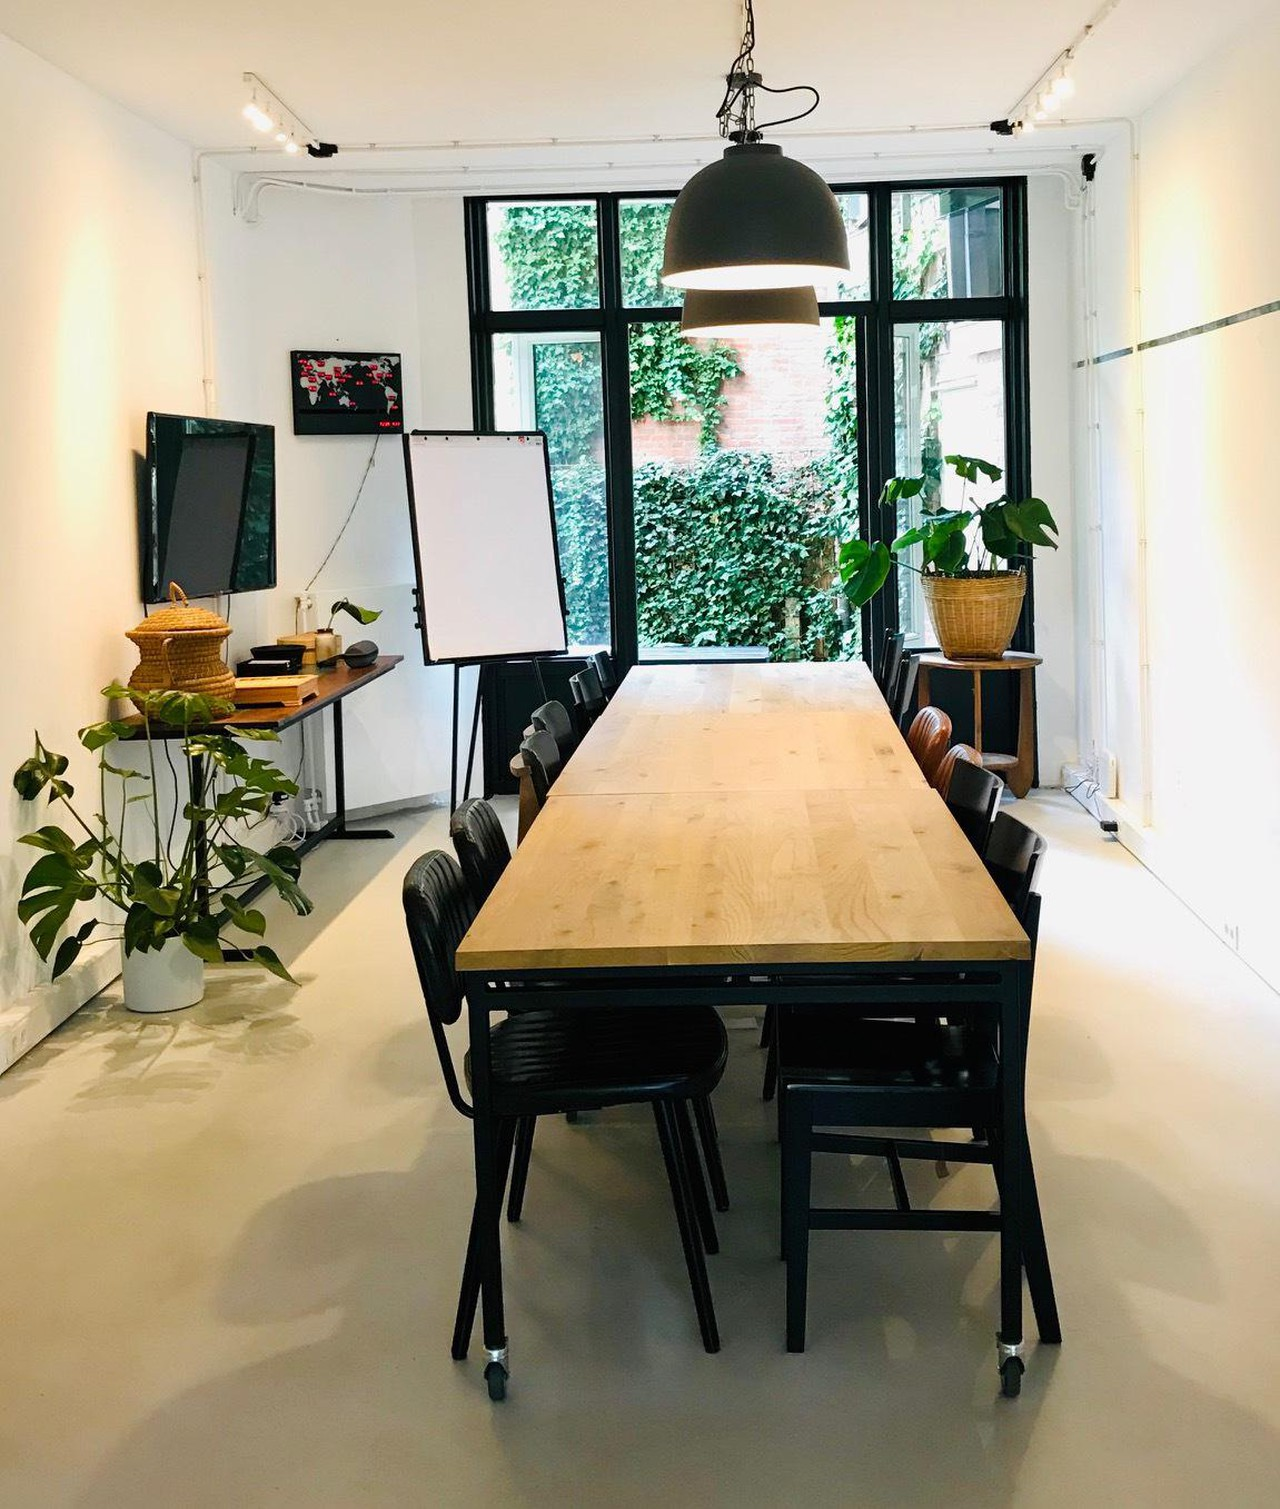 Amsterdam training rooms Meeting room Boardroom image 8